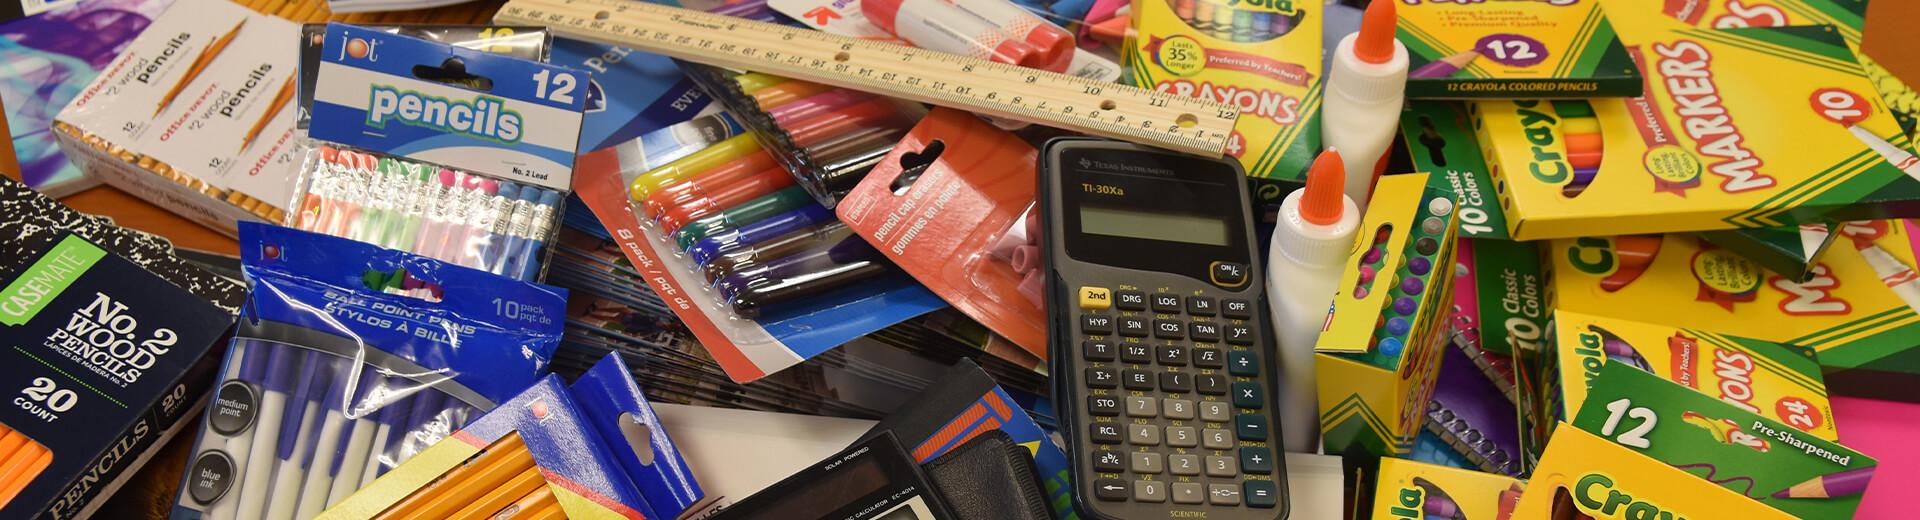 PacTec provides school supplies